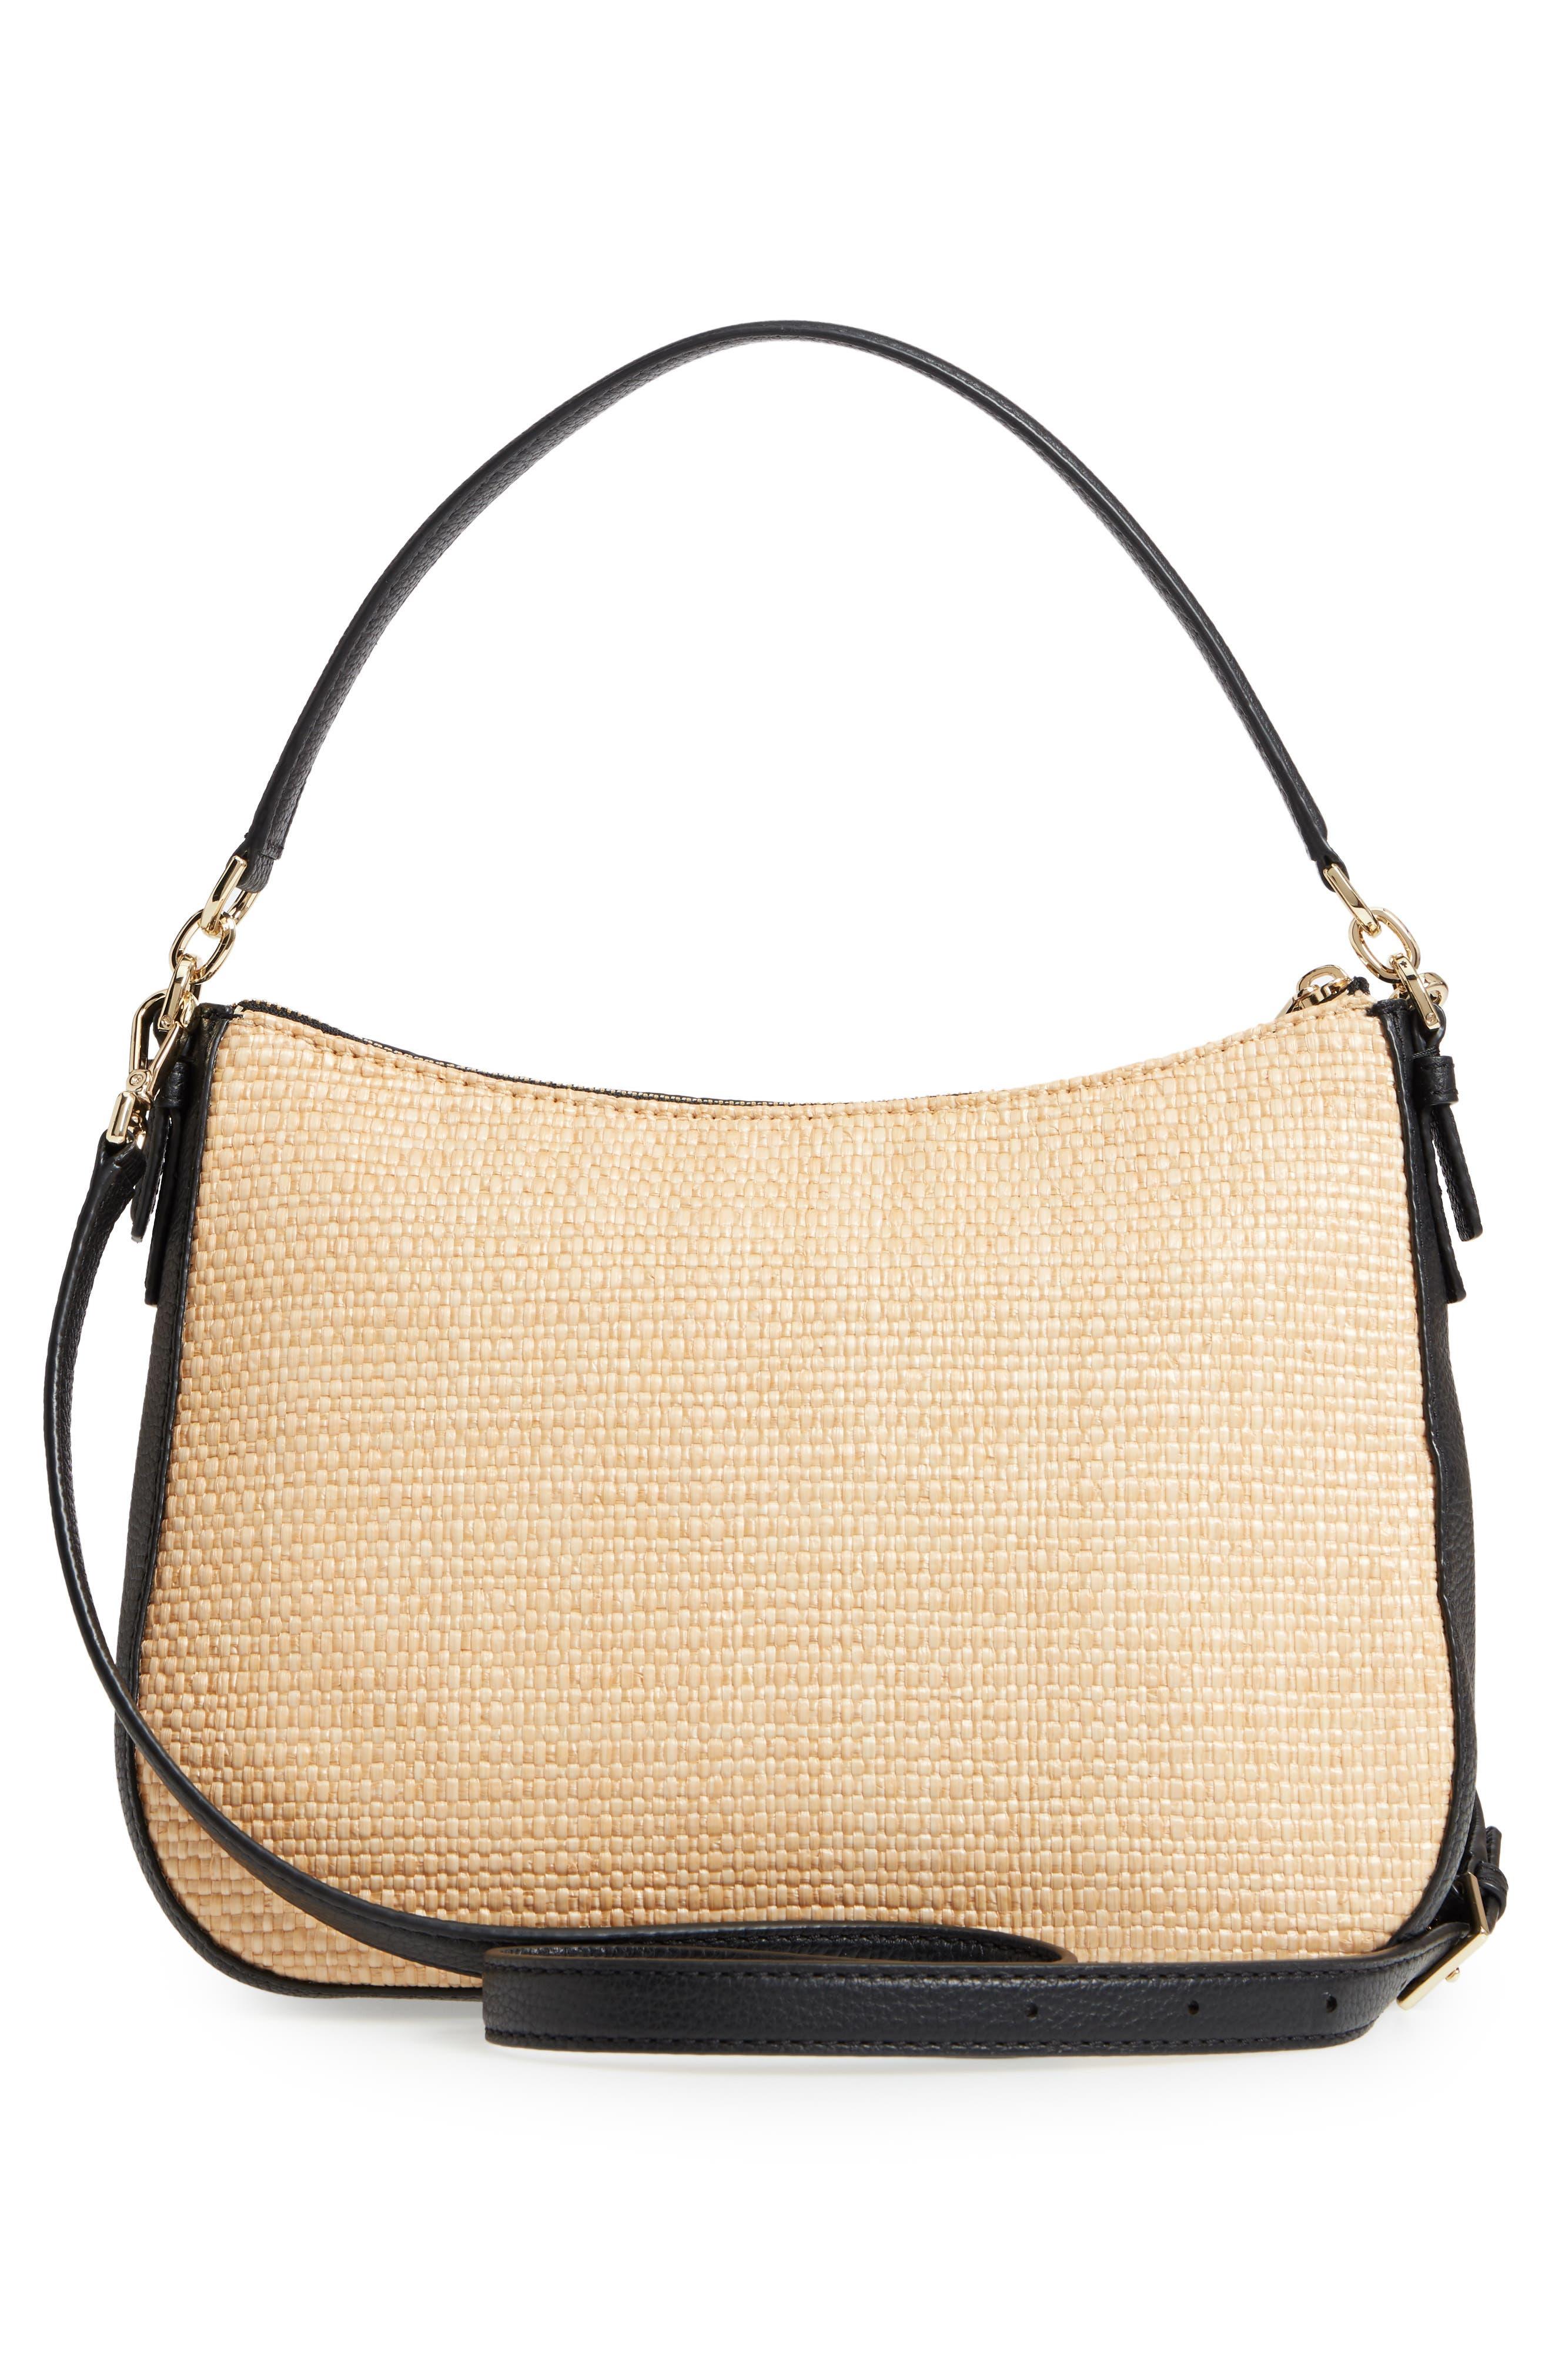 KATE SPADE NEW YORK,                             jackson street - colette straw & leather satchel,                             Alternate thumbnail 3, color,                             257